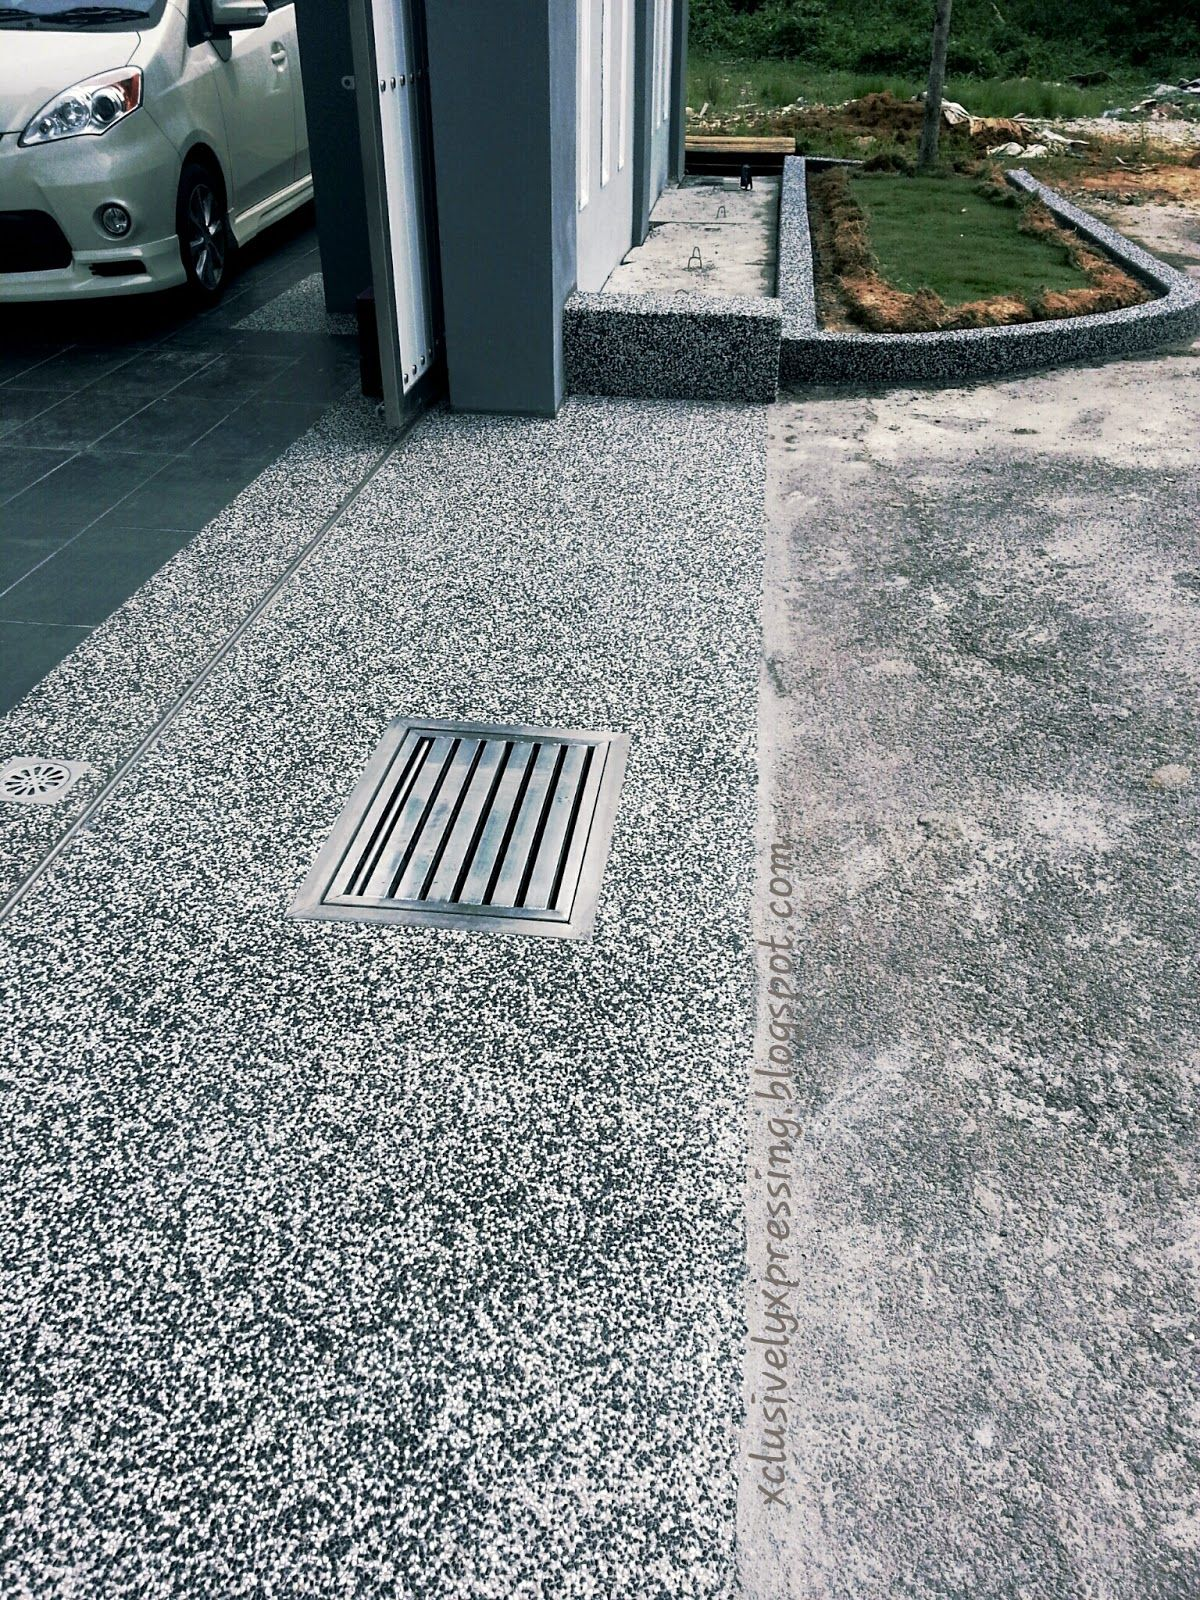 Pebble Wash For Car Porch Google Search Porch Materials Porch Pebbles